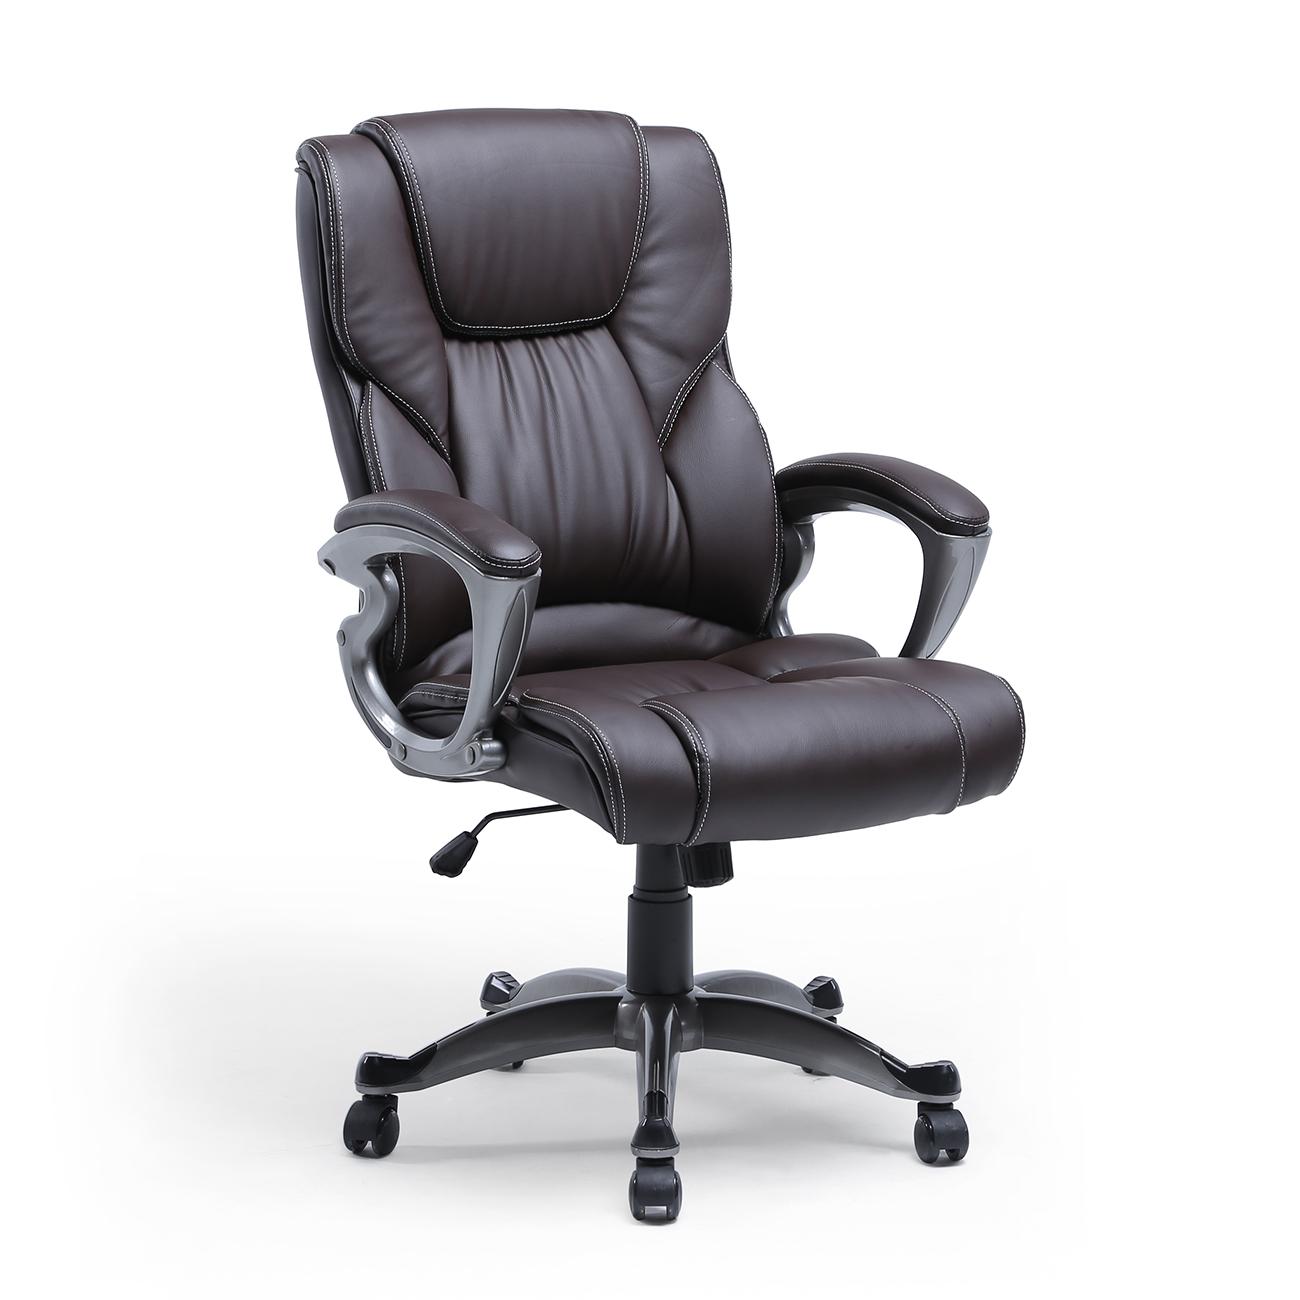 High Back Pu Leather Executive Ergonomic Office Chair Desk